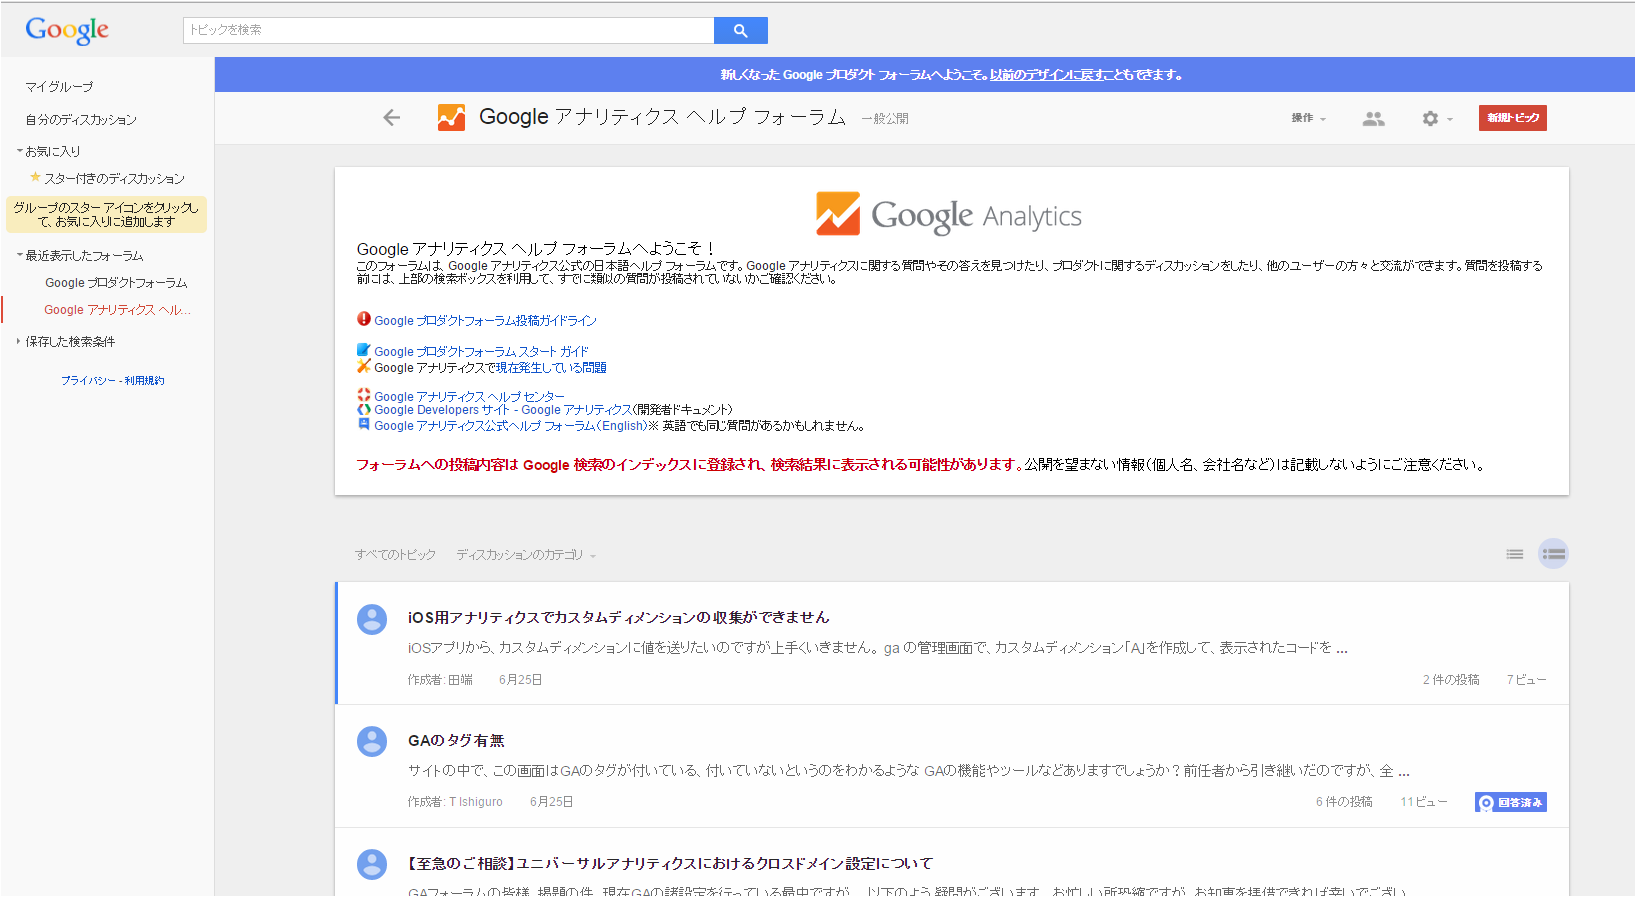 googleアナリティクスヘルプフォーラムのトップページ